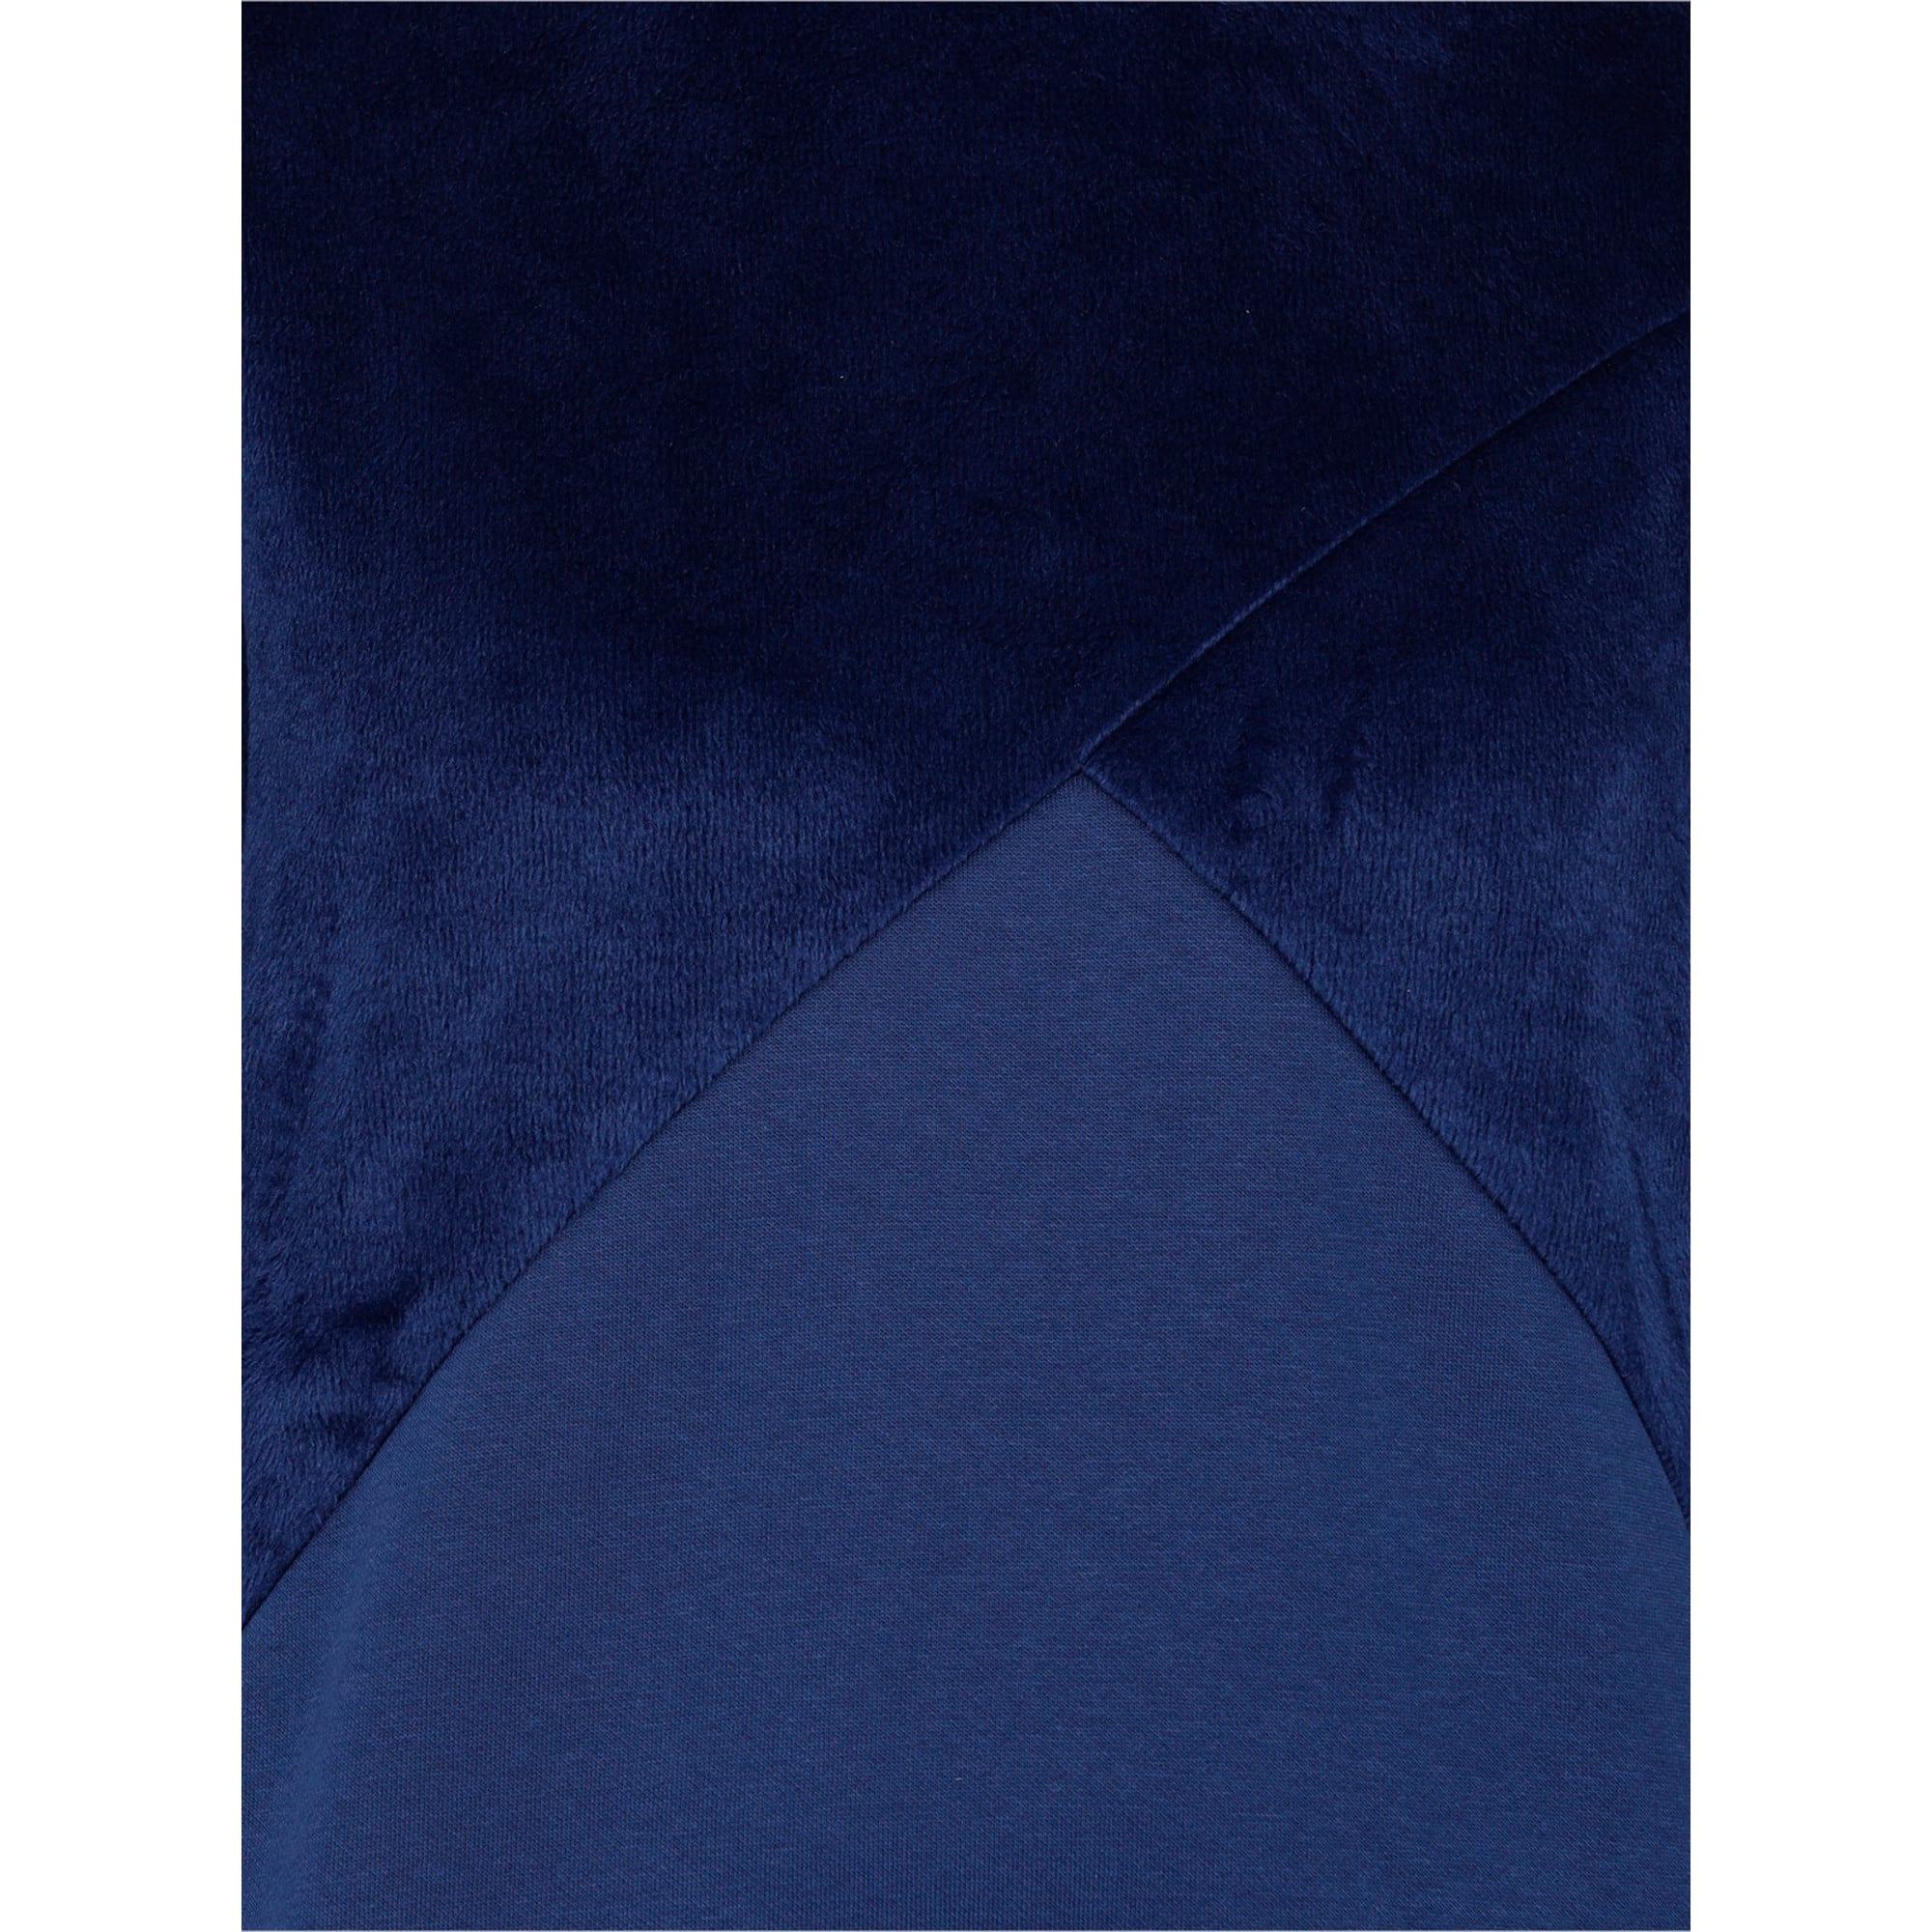 Thumbnail 5 of Archive Women's Fabric Block Sweater, Blue Depths, medium-IND